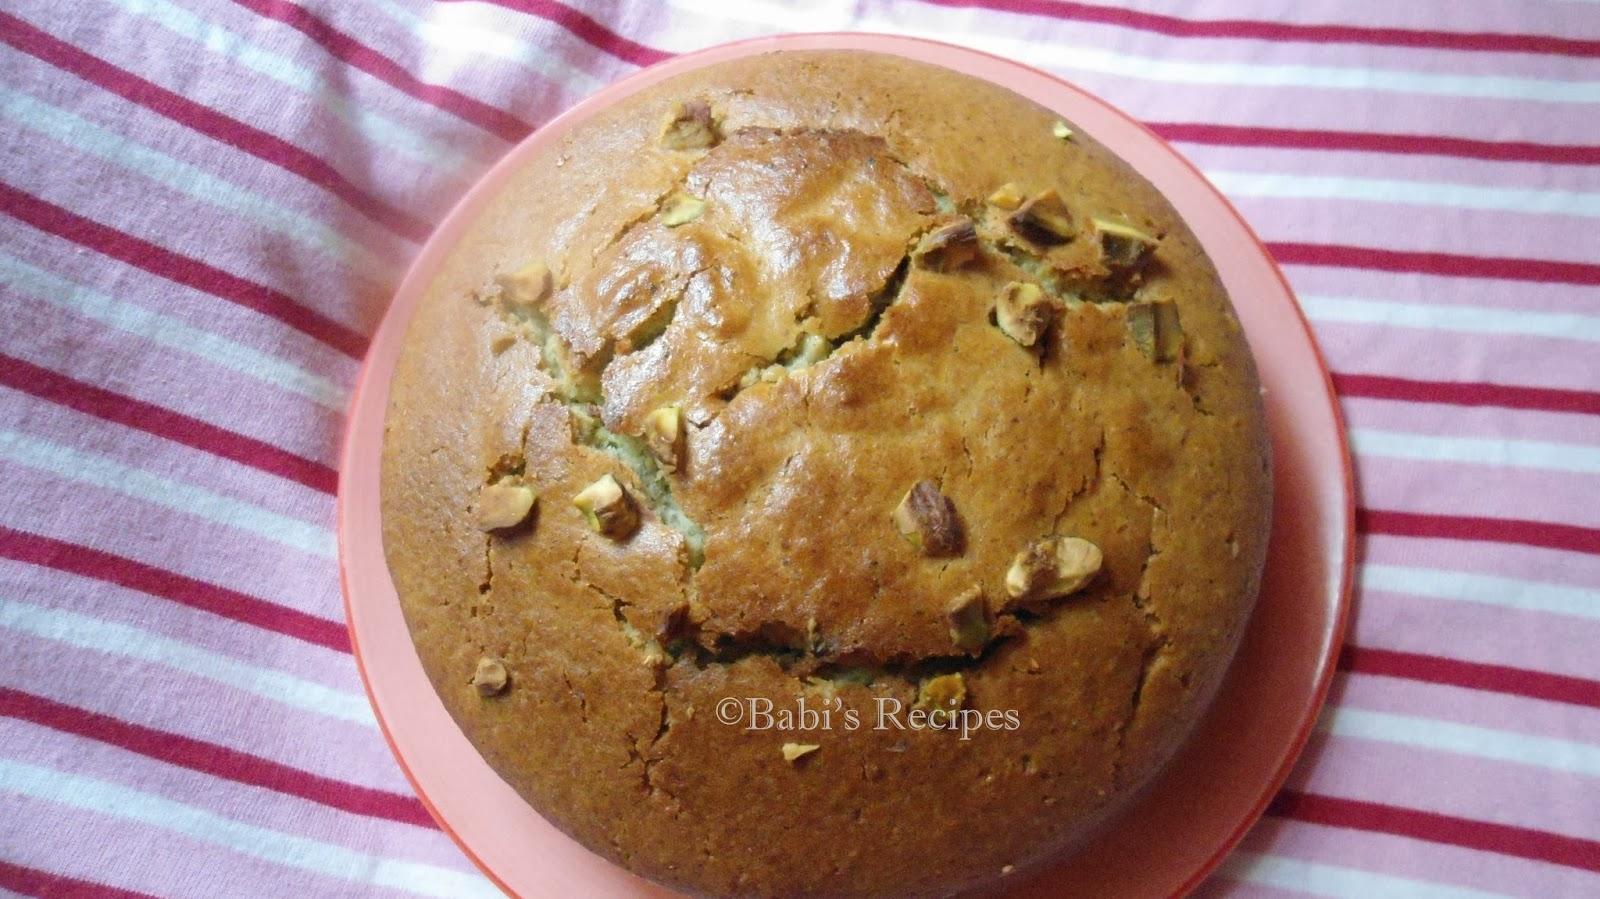 pistachio cardamon cake